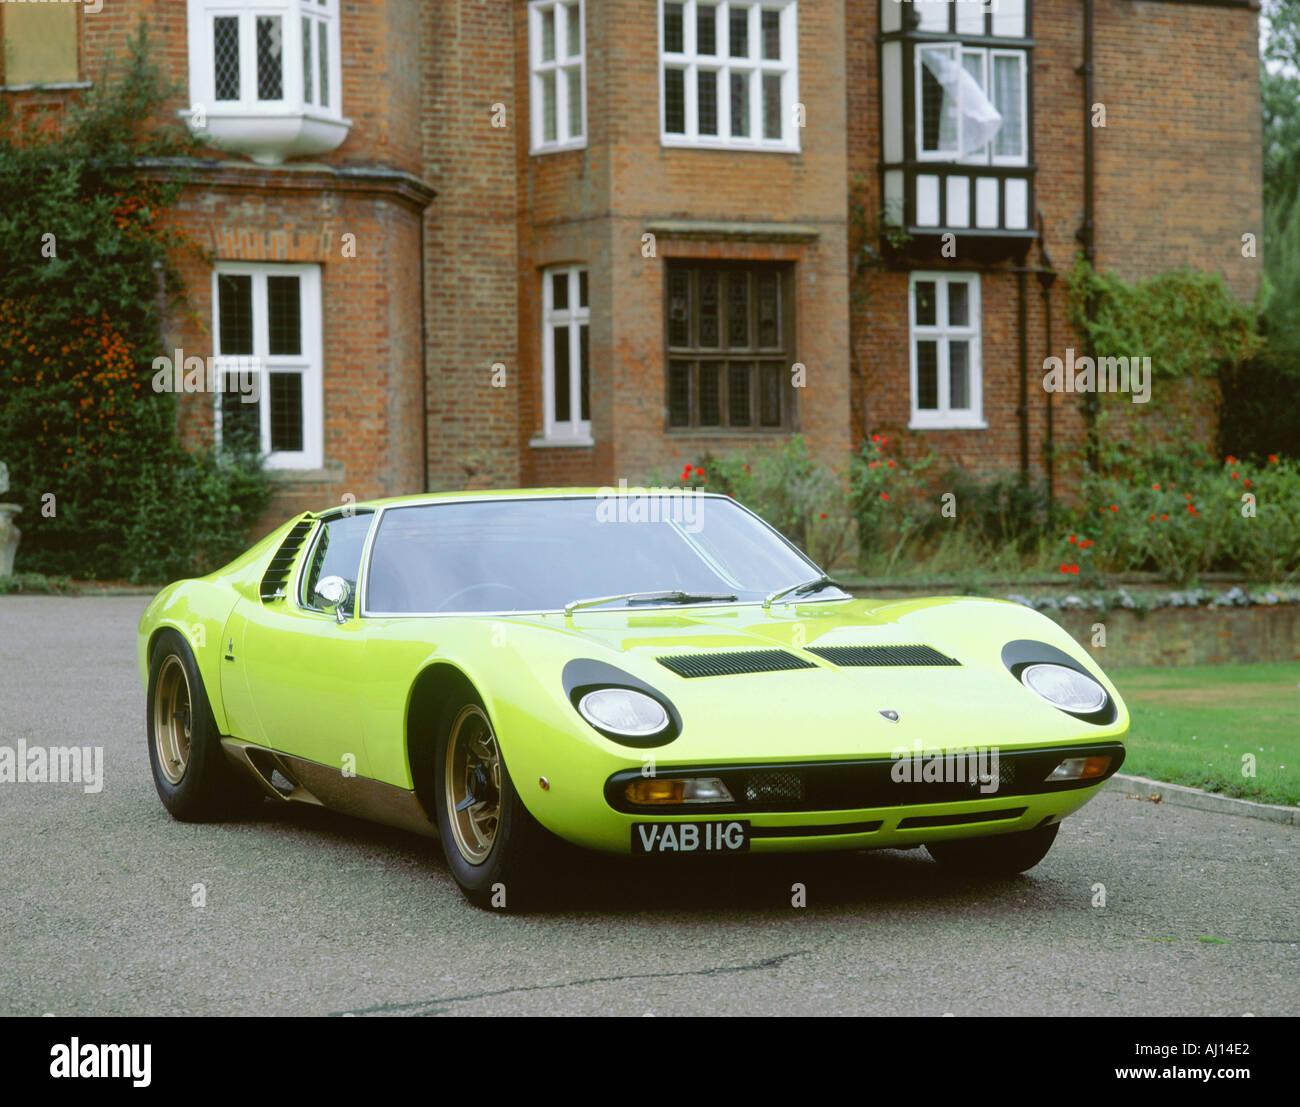 1968 Lamborghini Miura Sv Stock Photo 1184993 Alamy